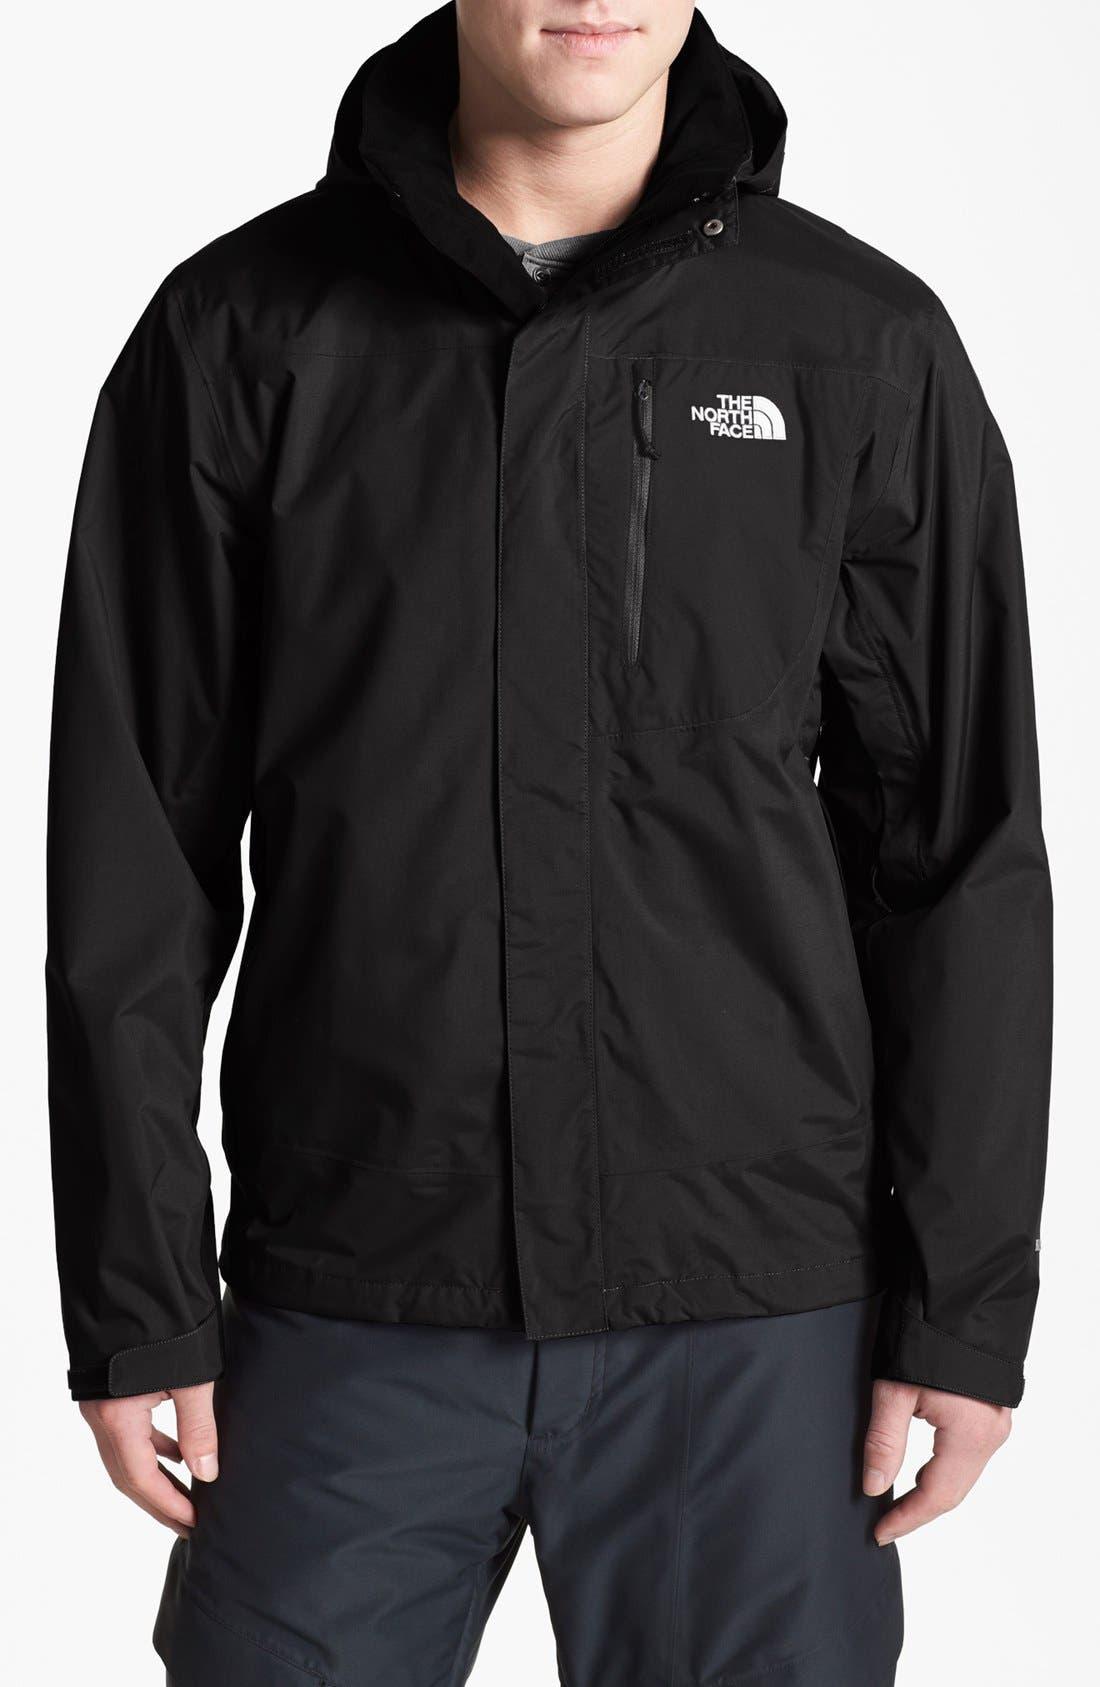 Main Image - The North Face 'Varius Guide' Seam Sealed Waterproof Jacket